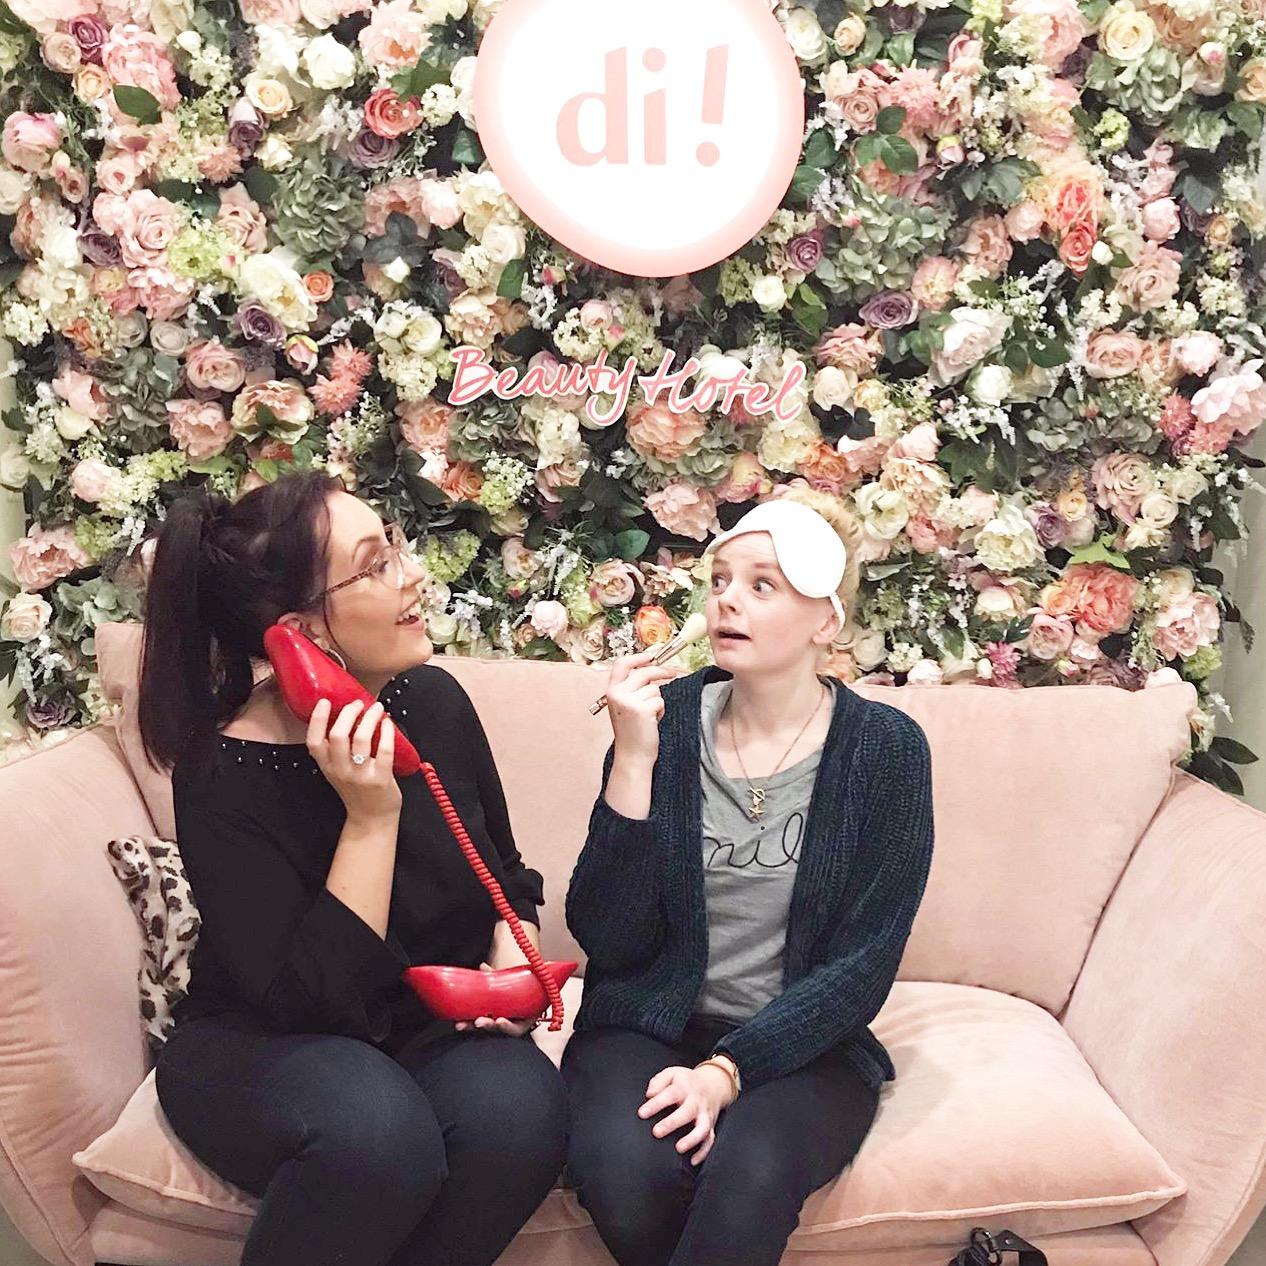 Het beauty hotel van DI All About Beauty